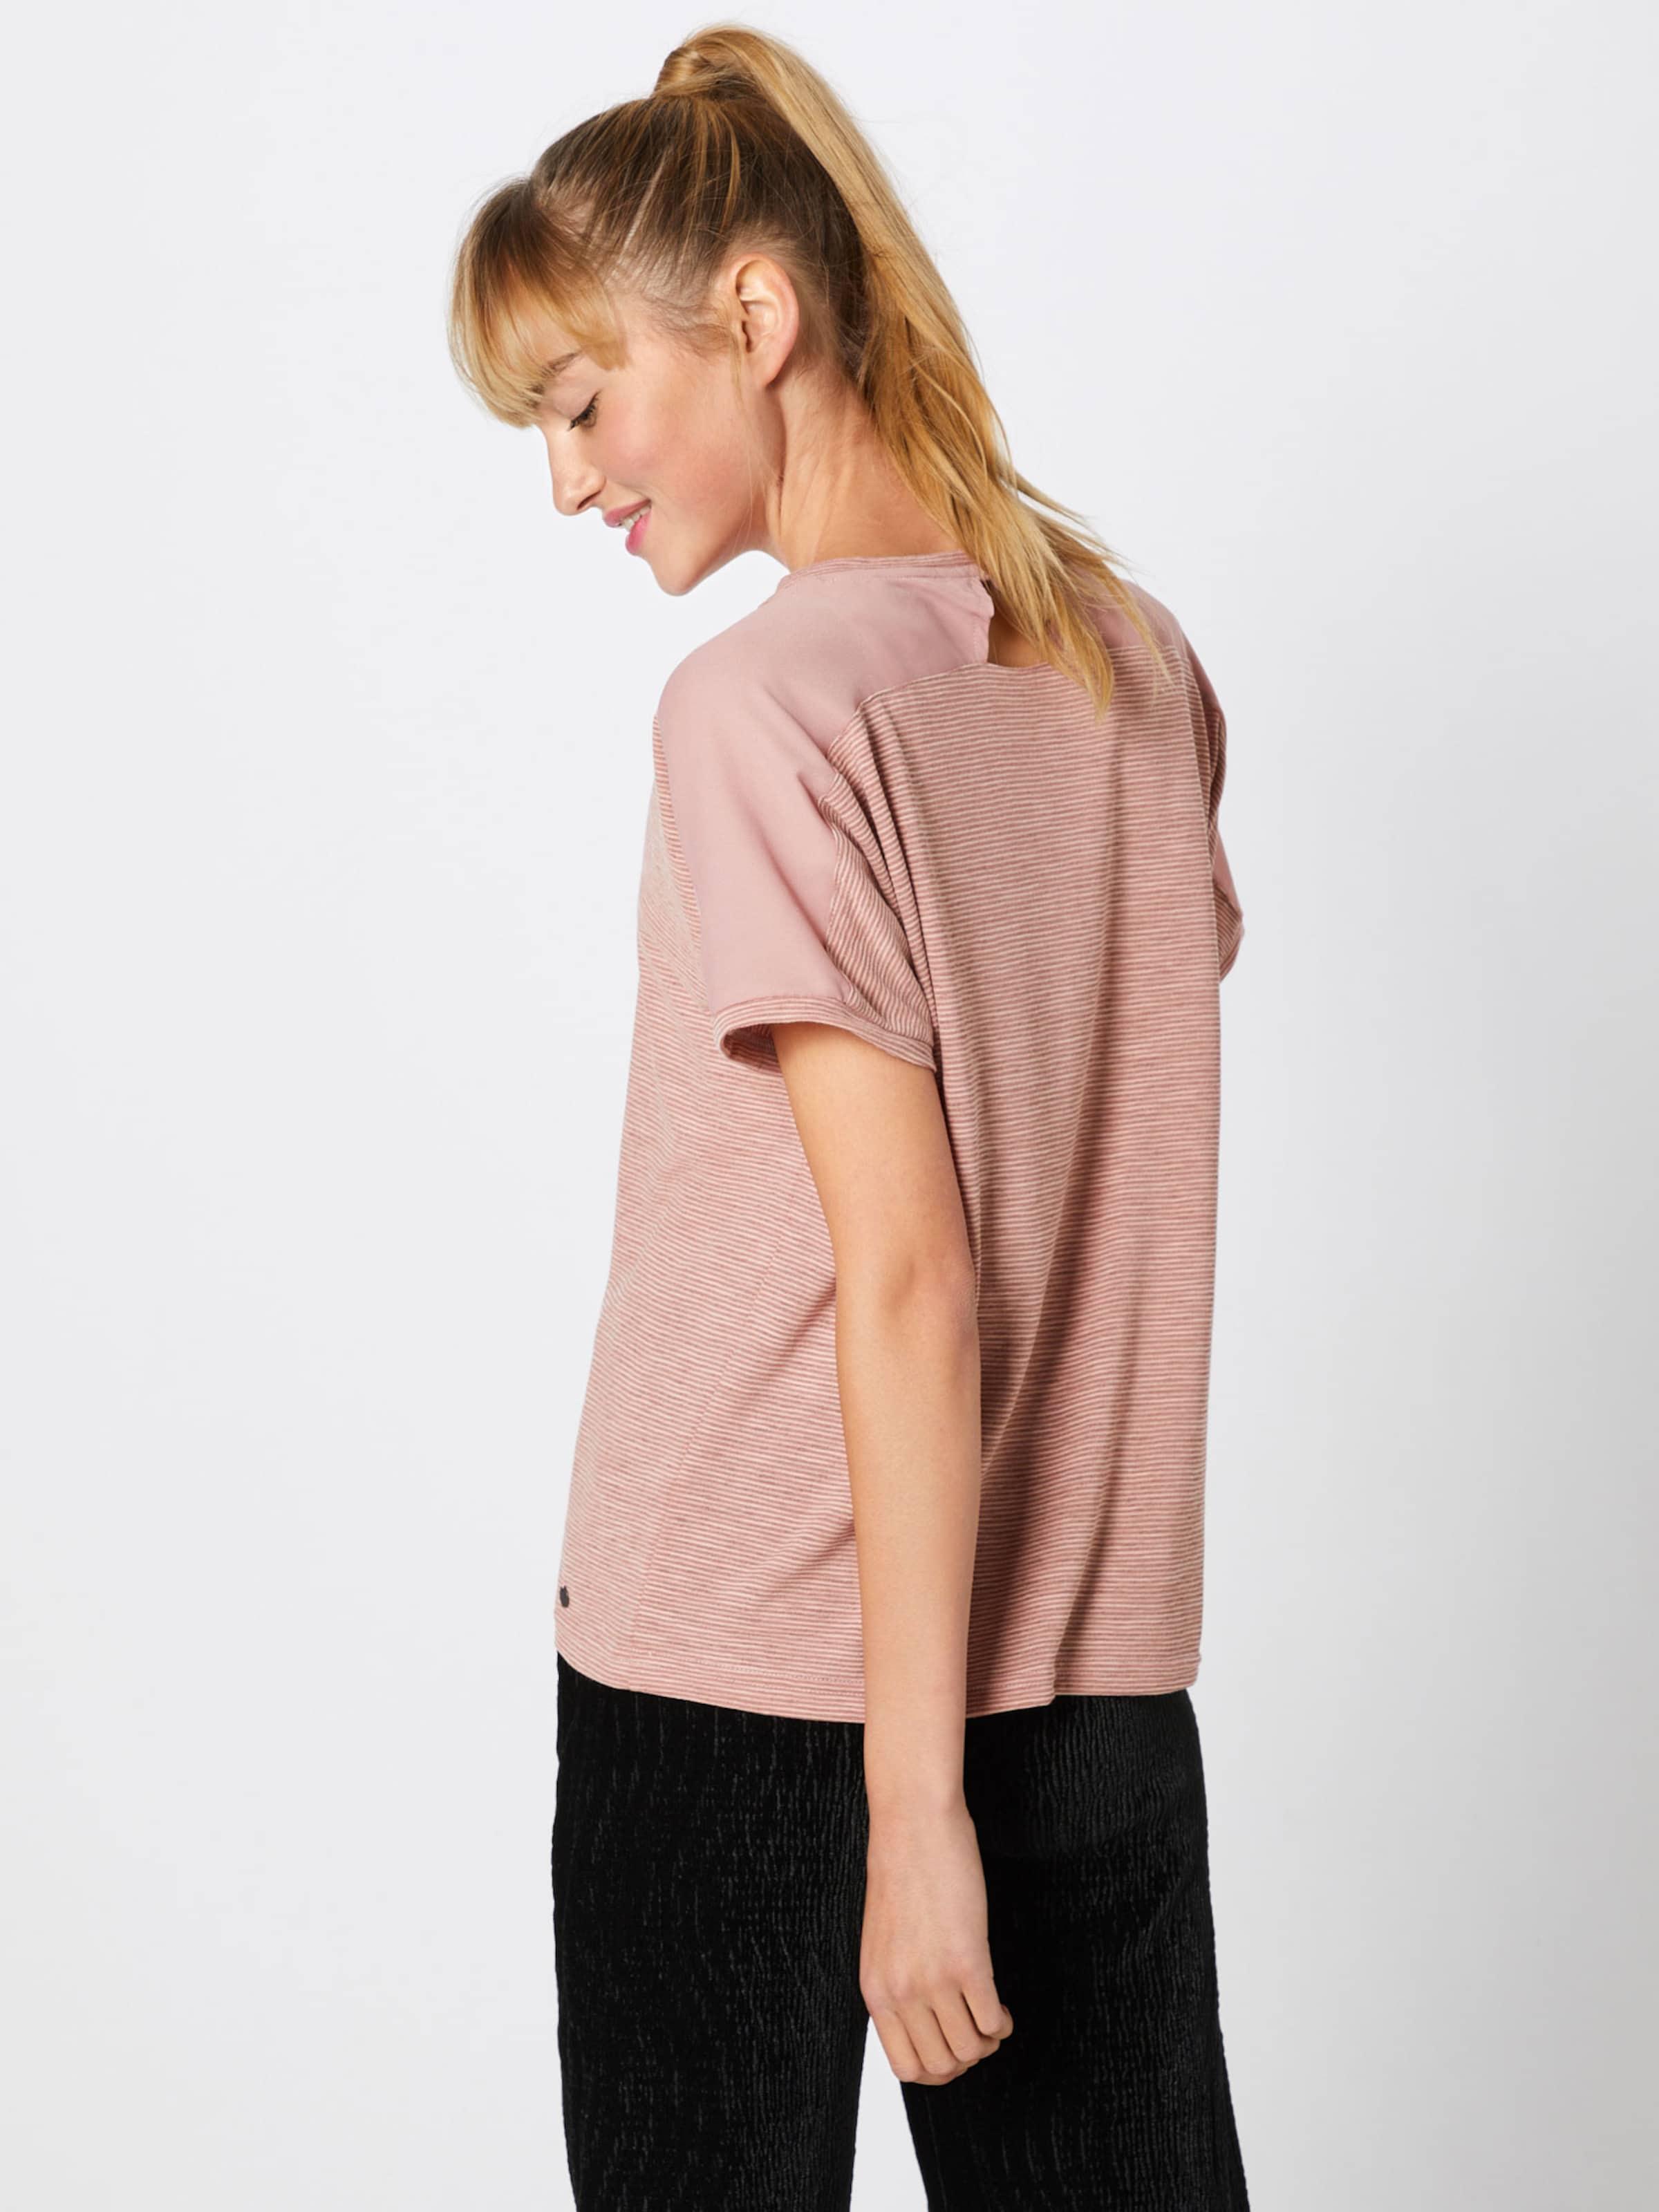 Nümph Shirt In Rosa Nümph Nümph In Shirt Shirt Rosa RLA4j53